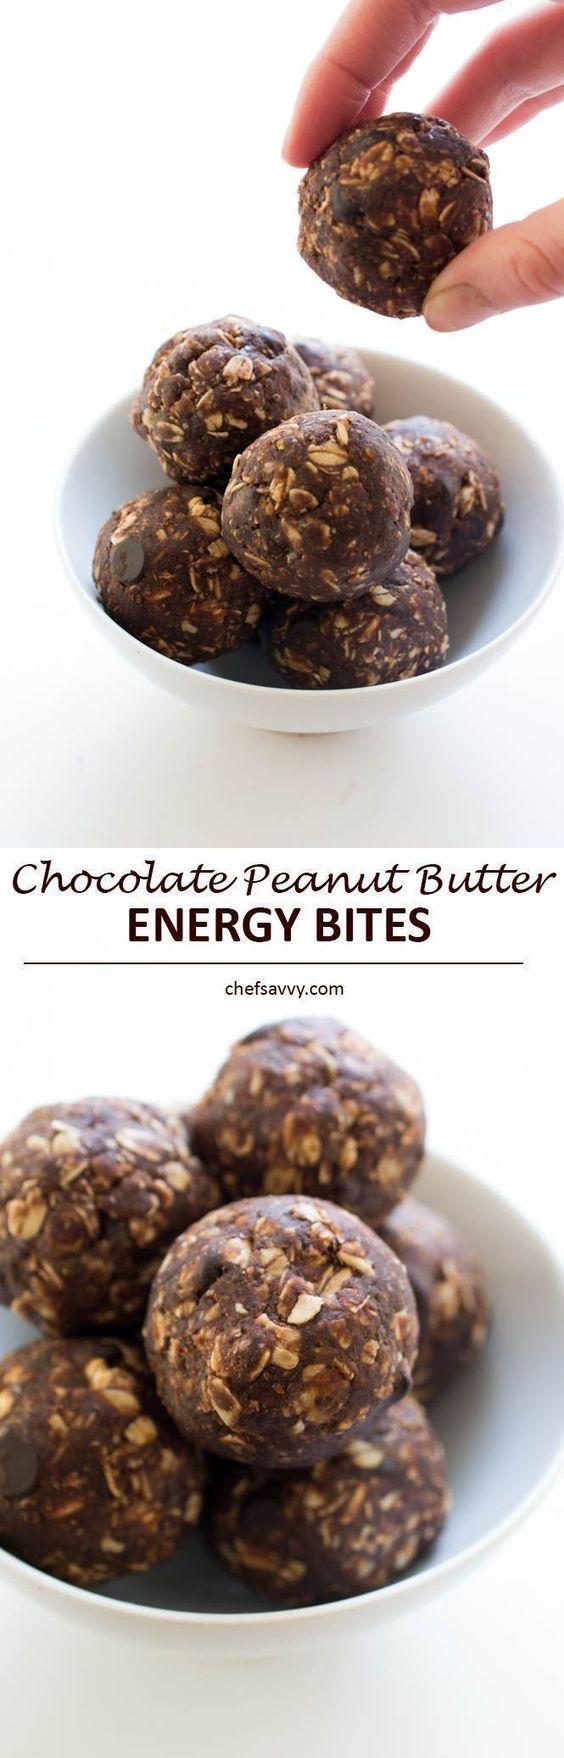 No Bake Chocolate Peanut Butter Energy Bites